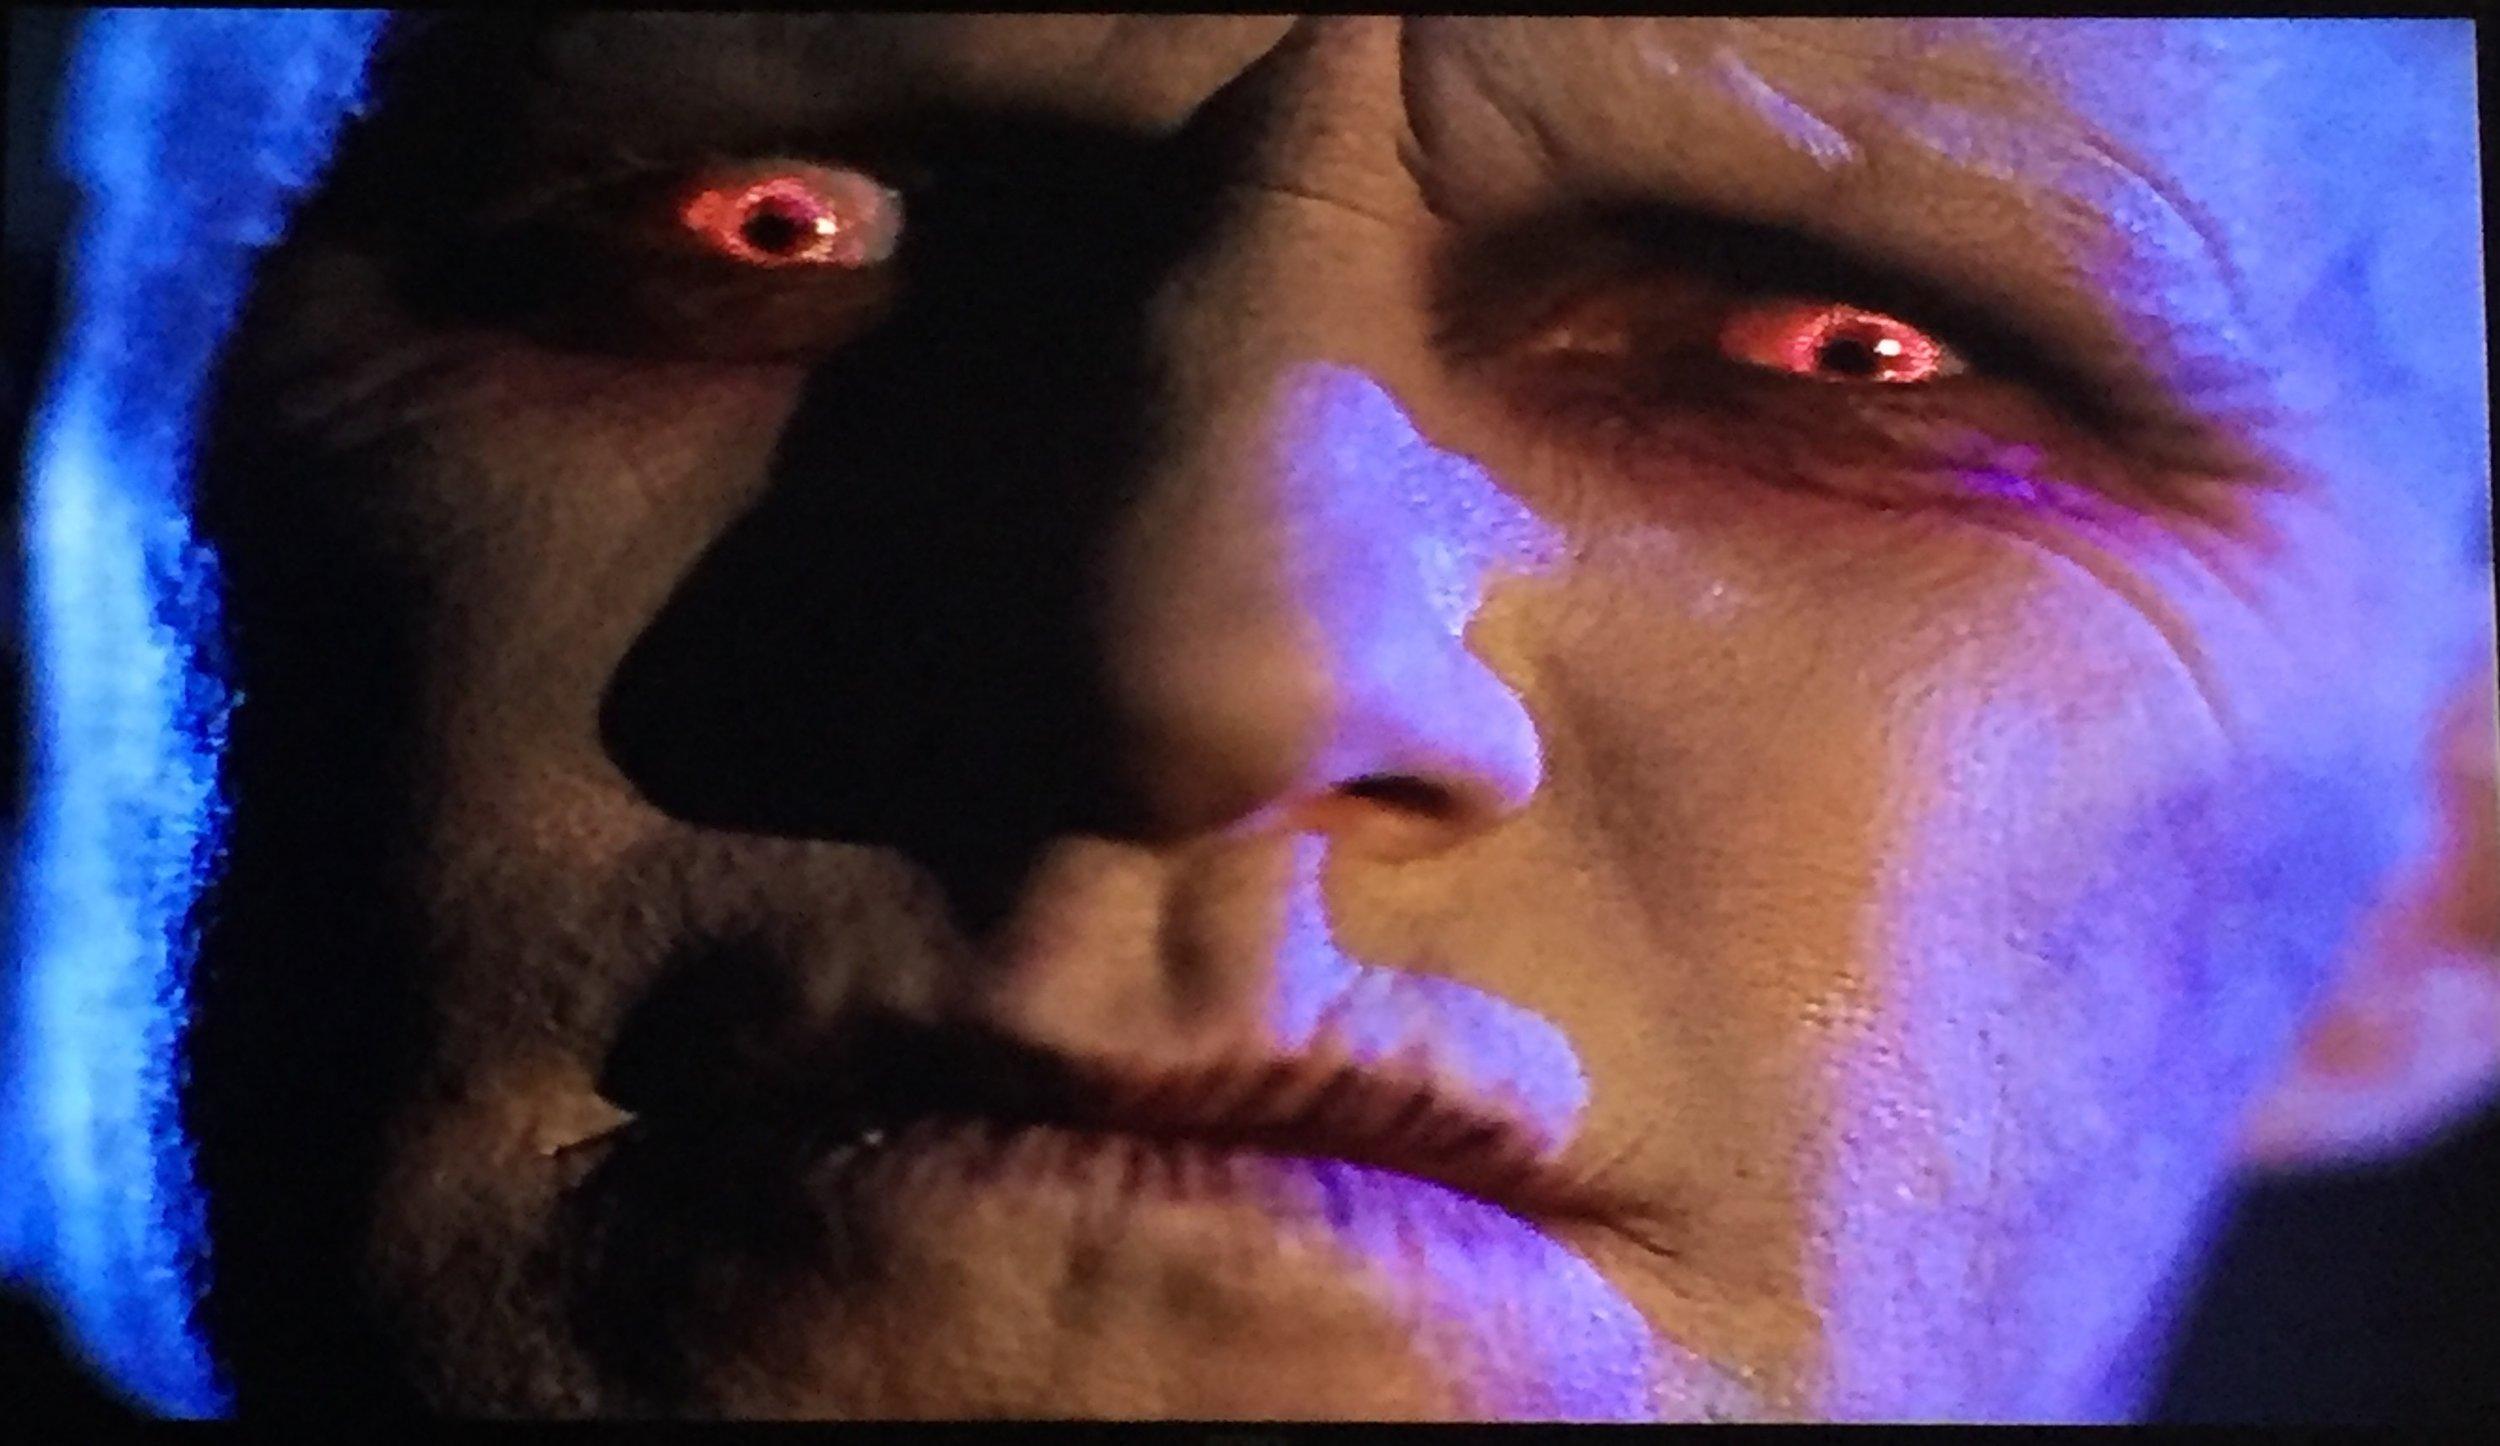 Swirly red eyes...